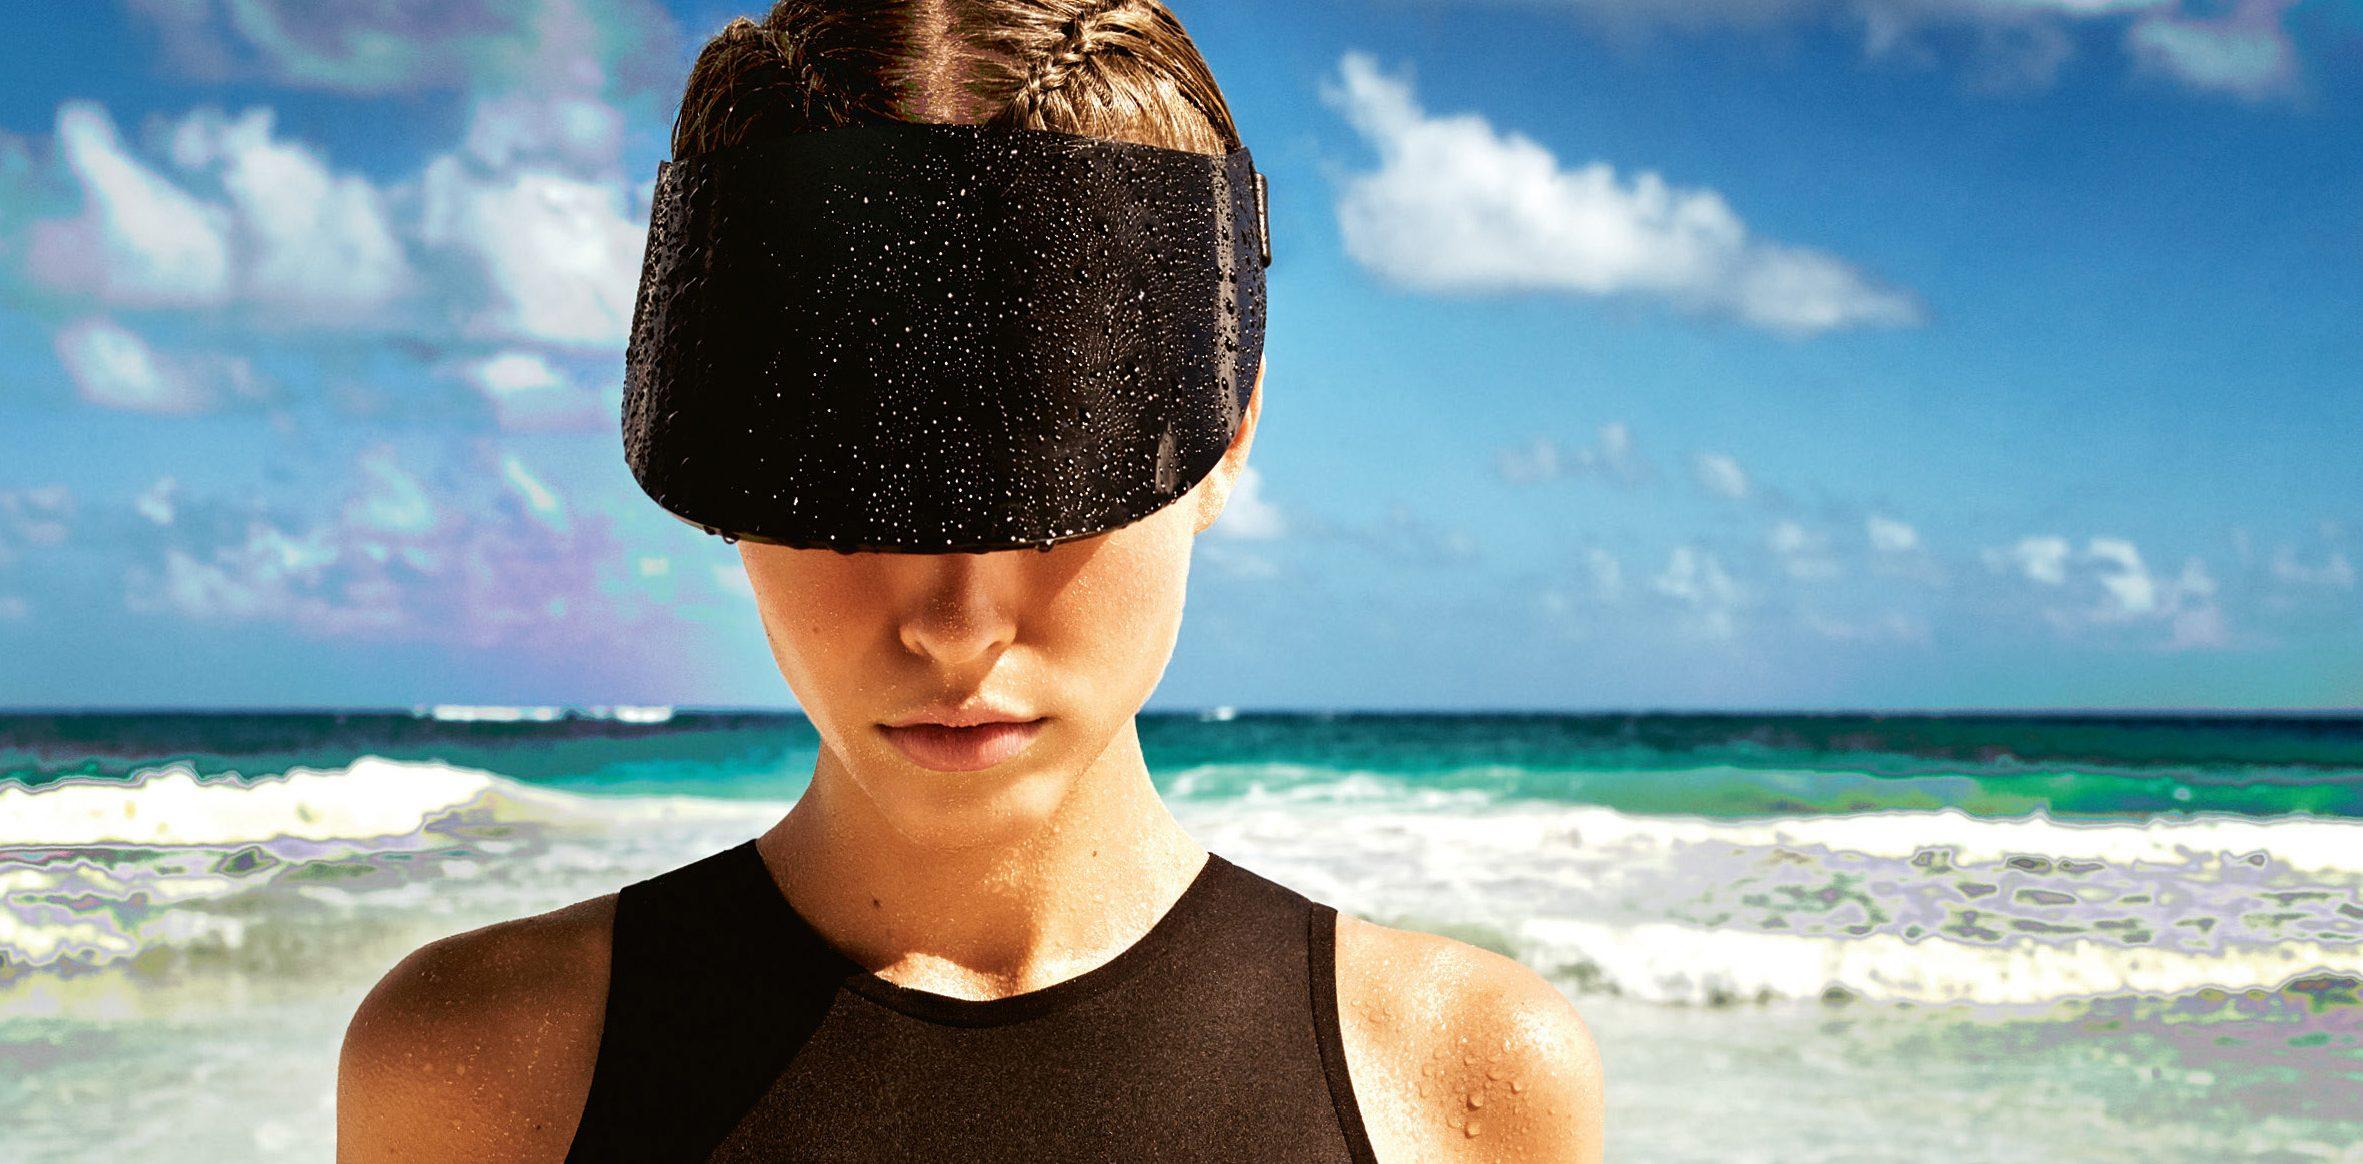 Caroline Kelley by Enrique Badulescu for S Magazine 9